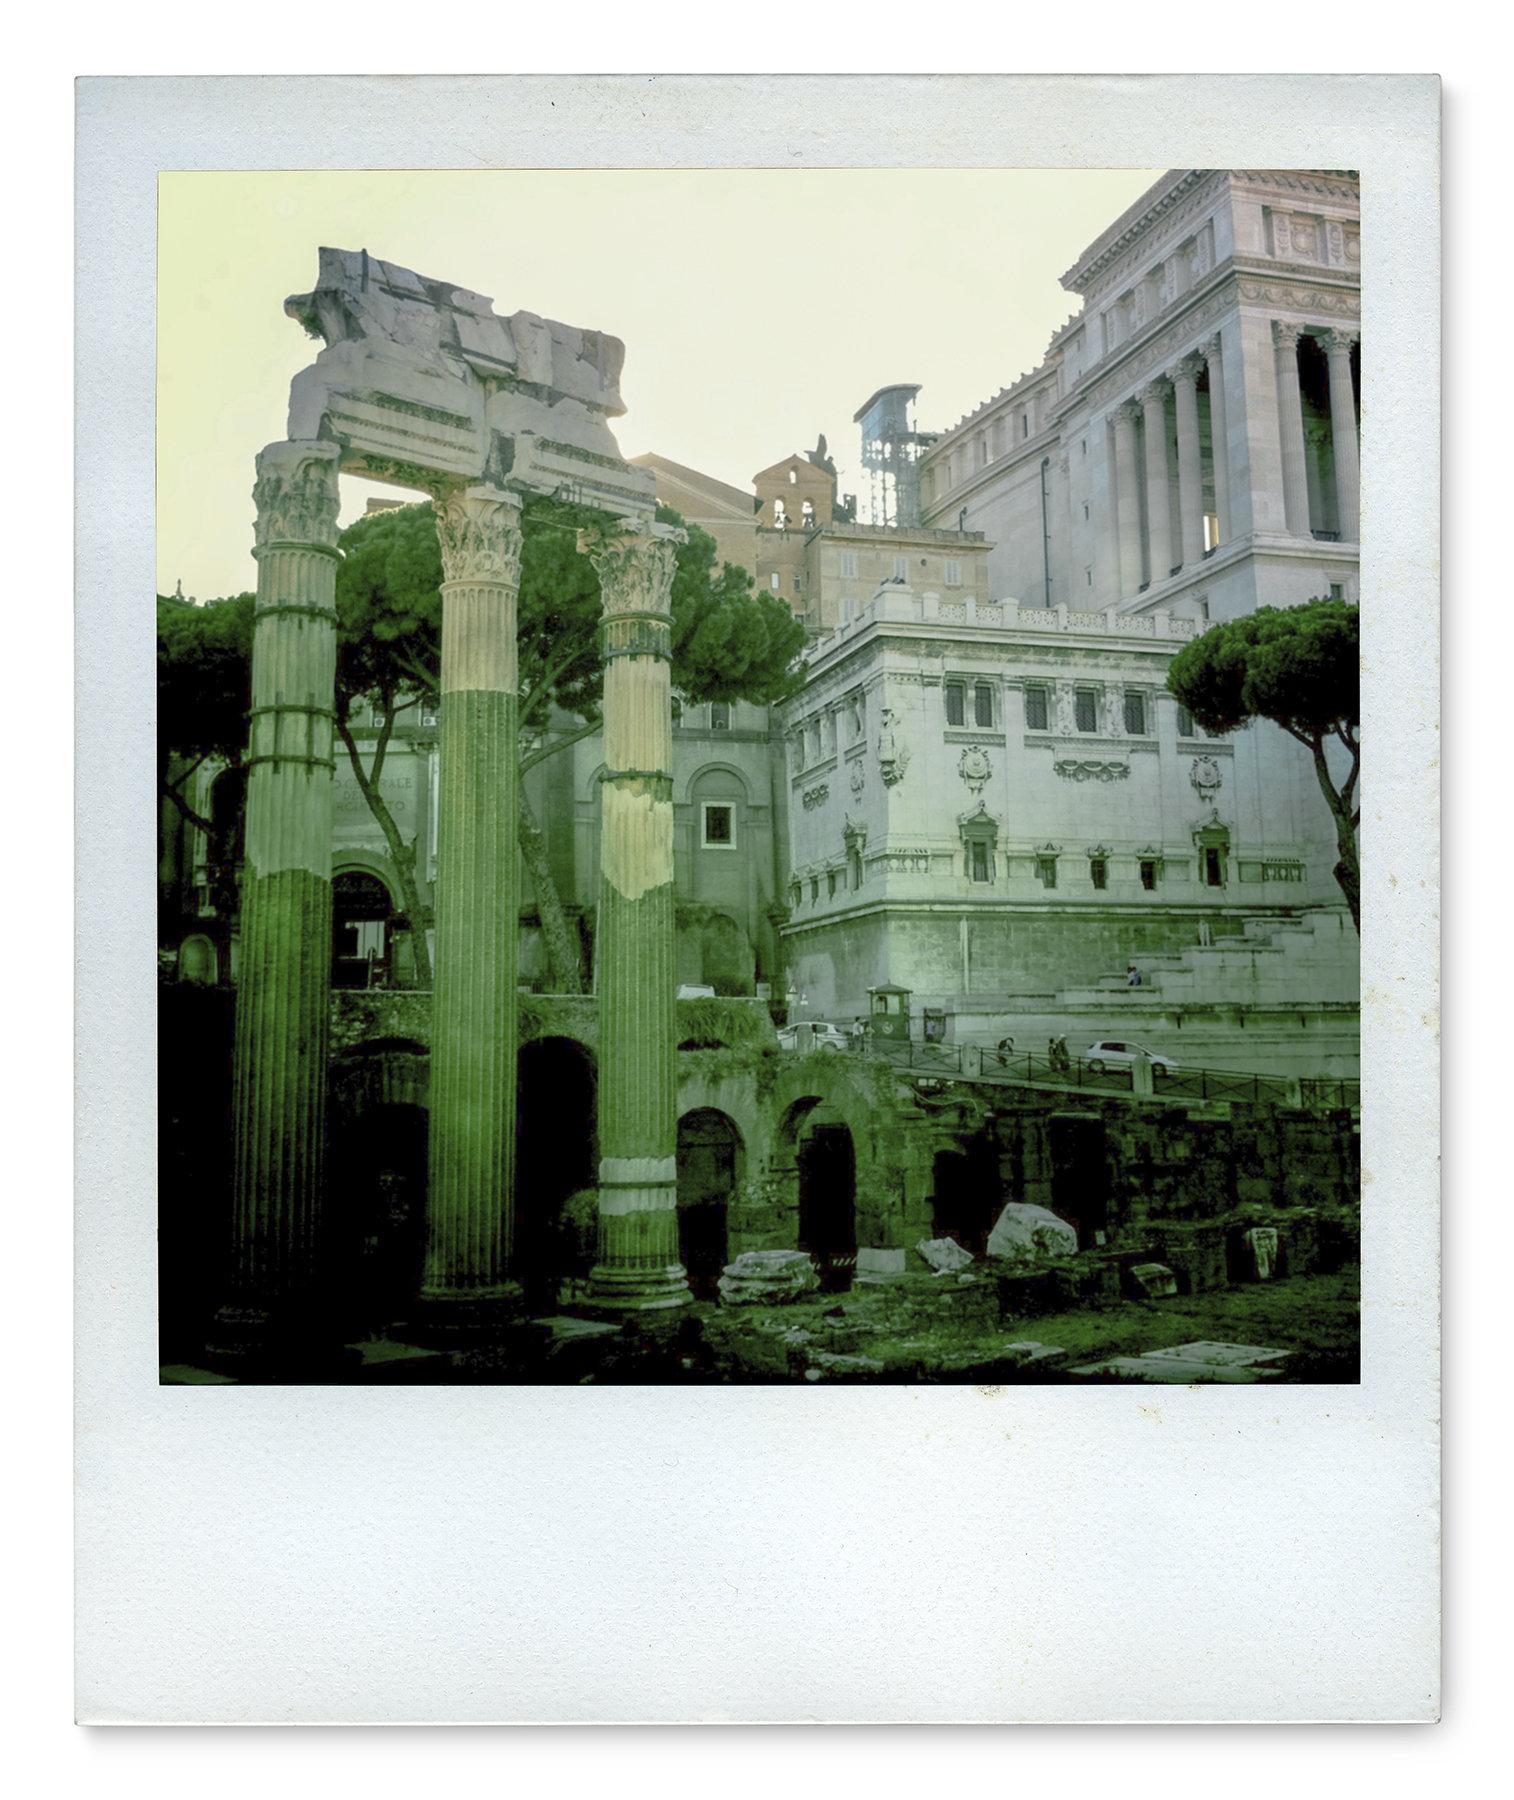 006_Polaroid SX70_IMG_2413.jpg